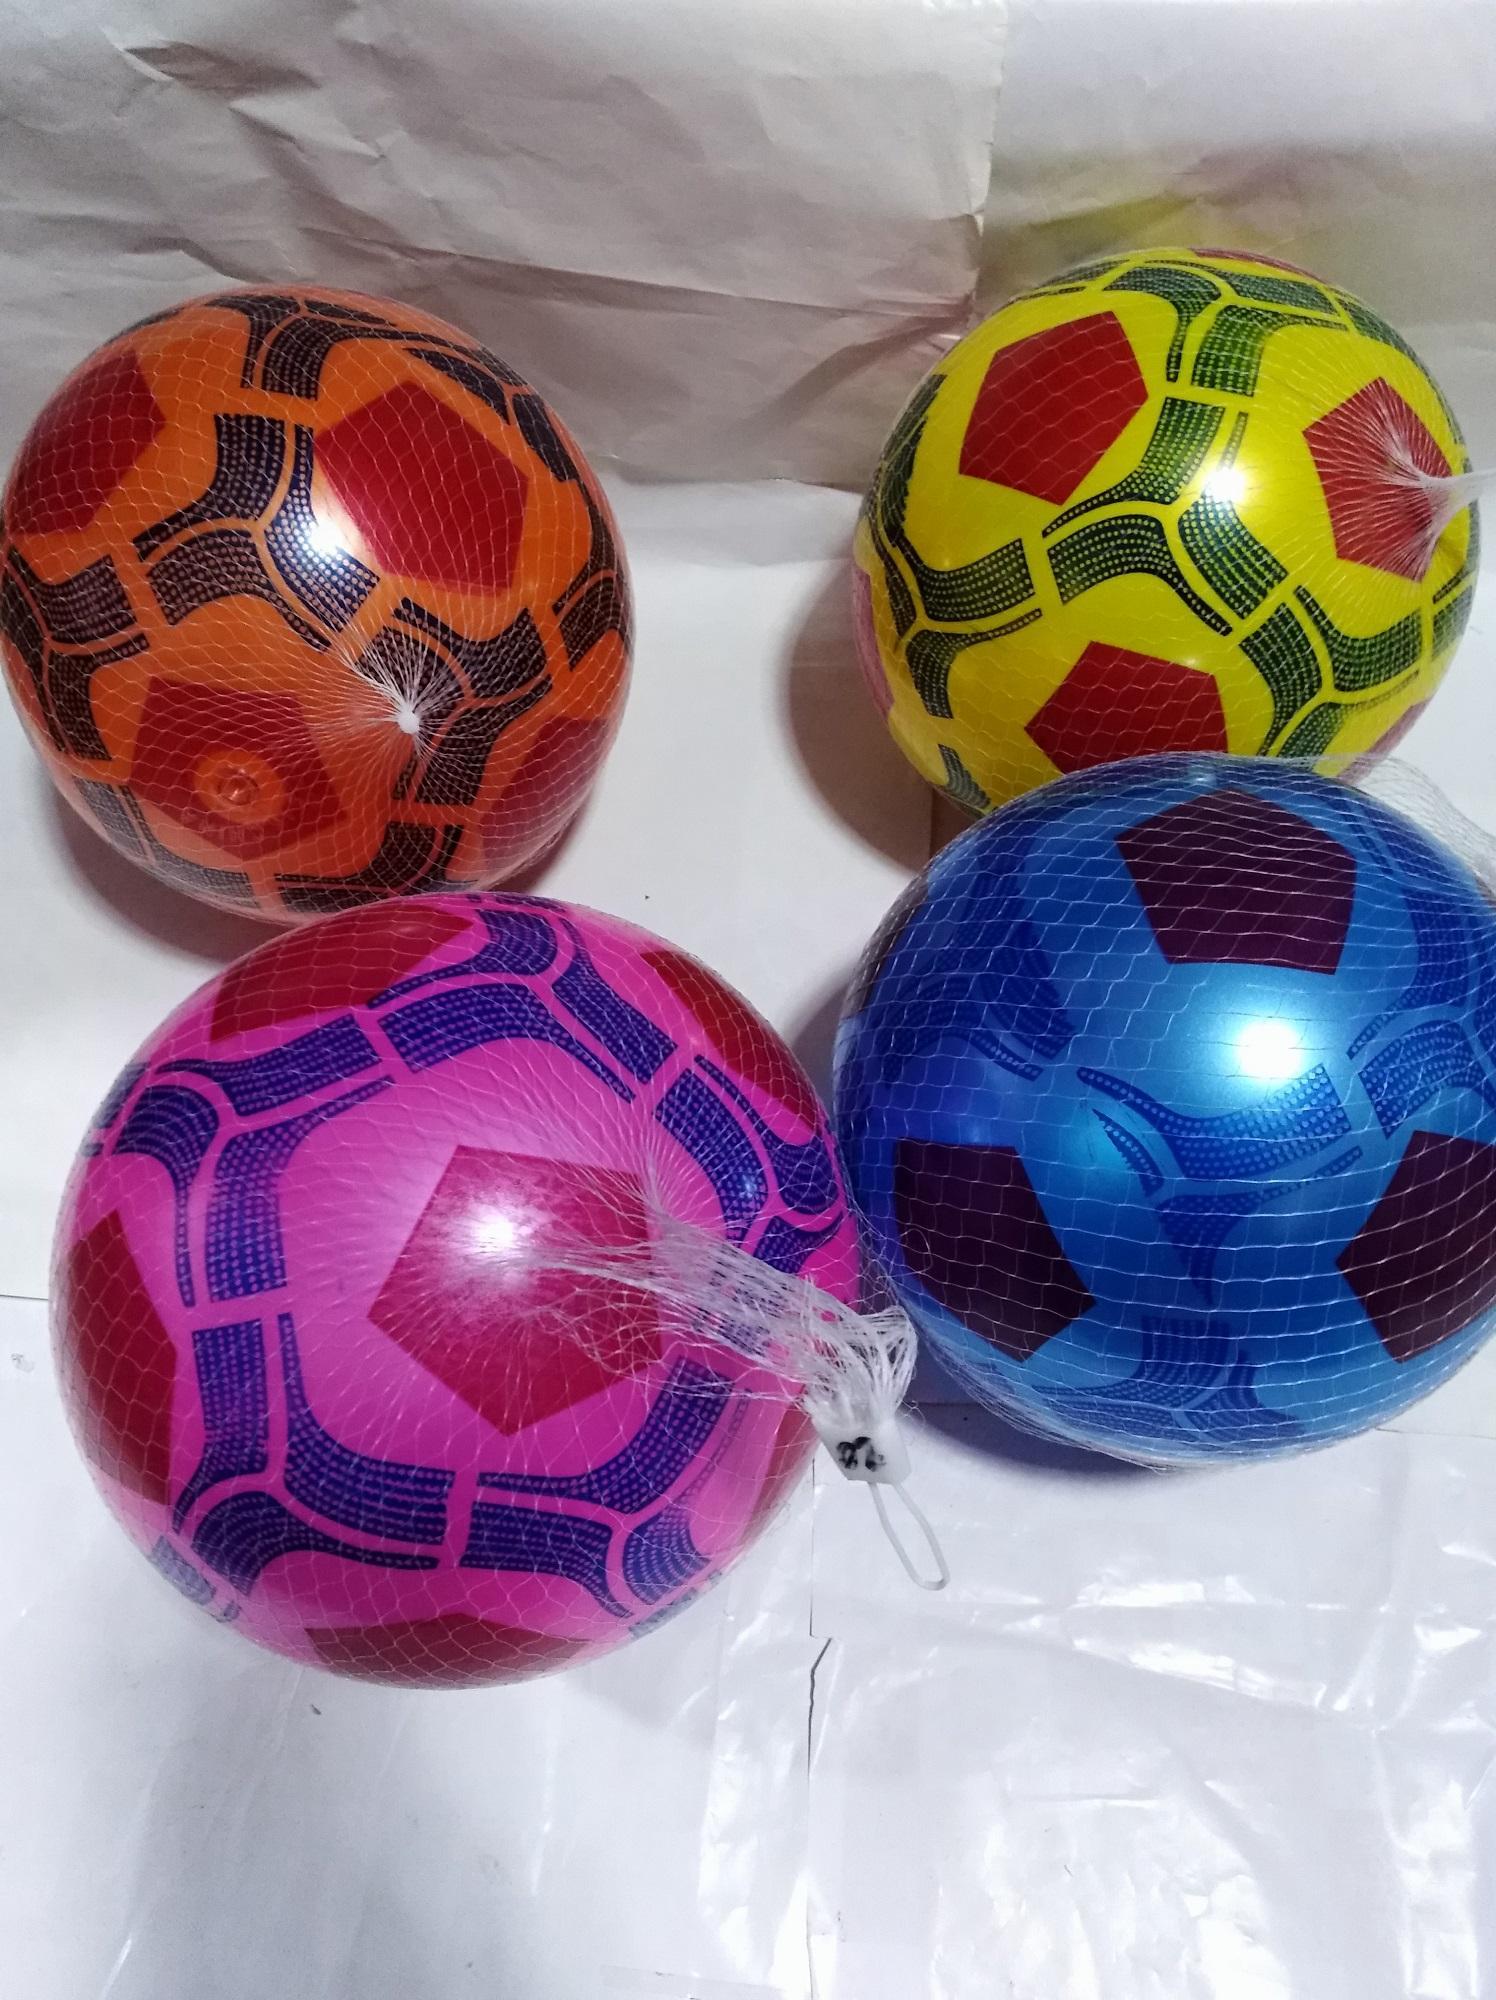 Balls By Superstar789.